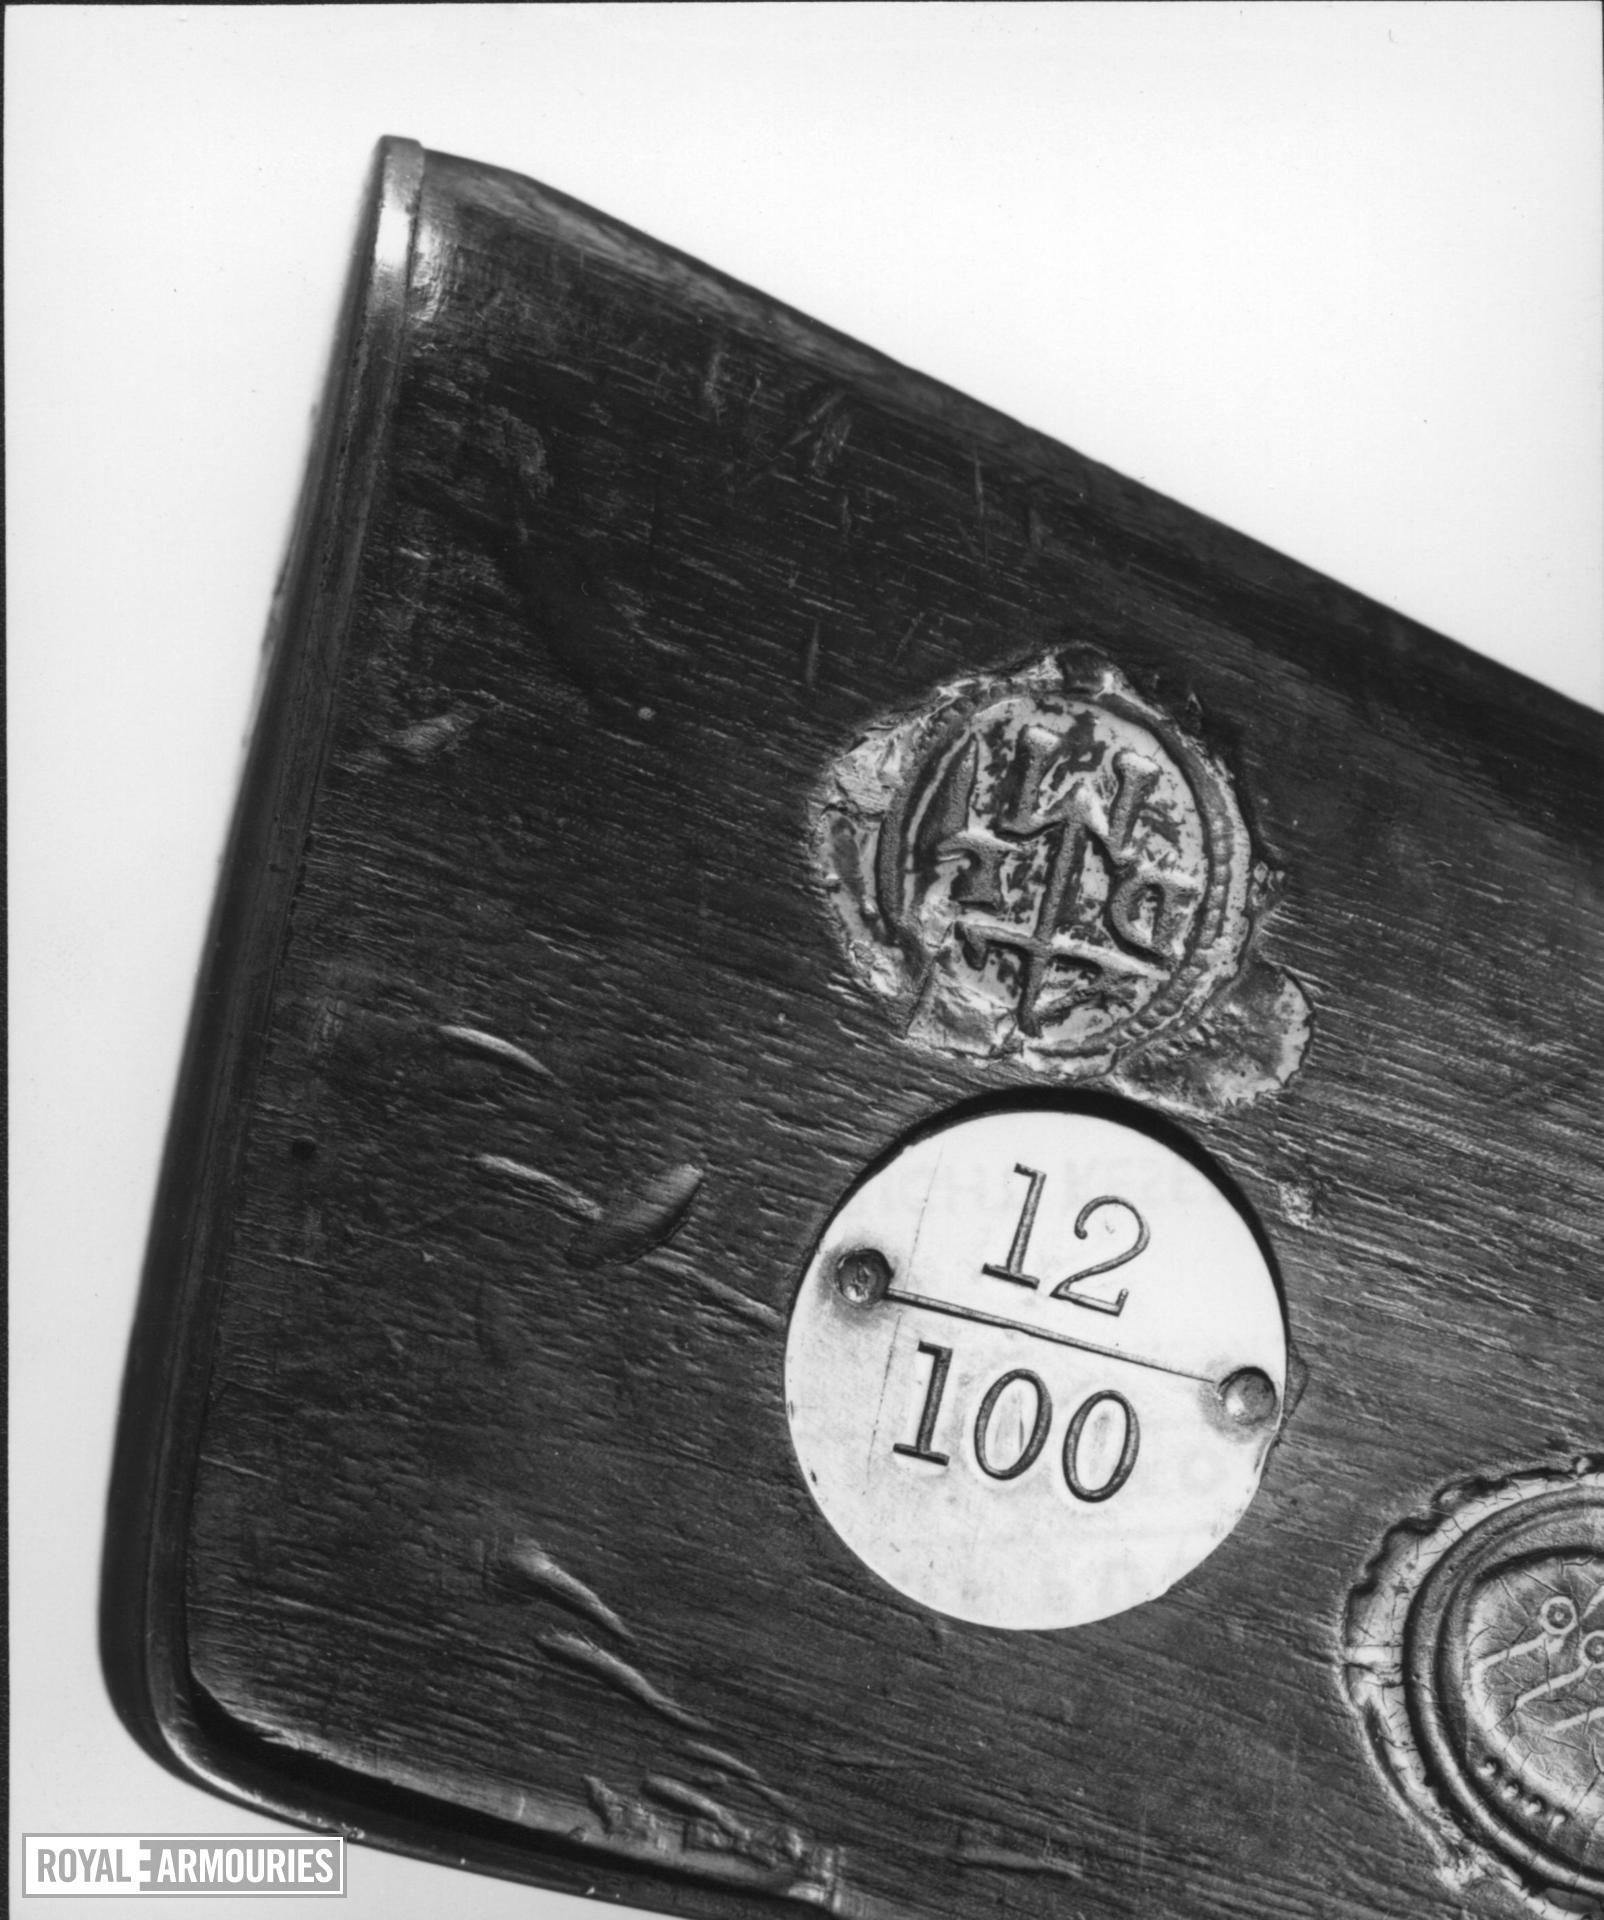 Flintlock muzzle-loading military musket - Hessian model, sealed pattern Hessian (?) Sealed Pattern